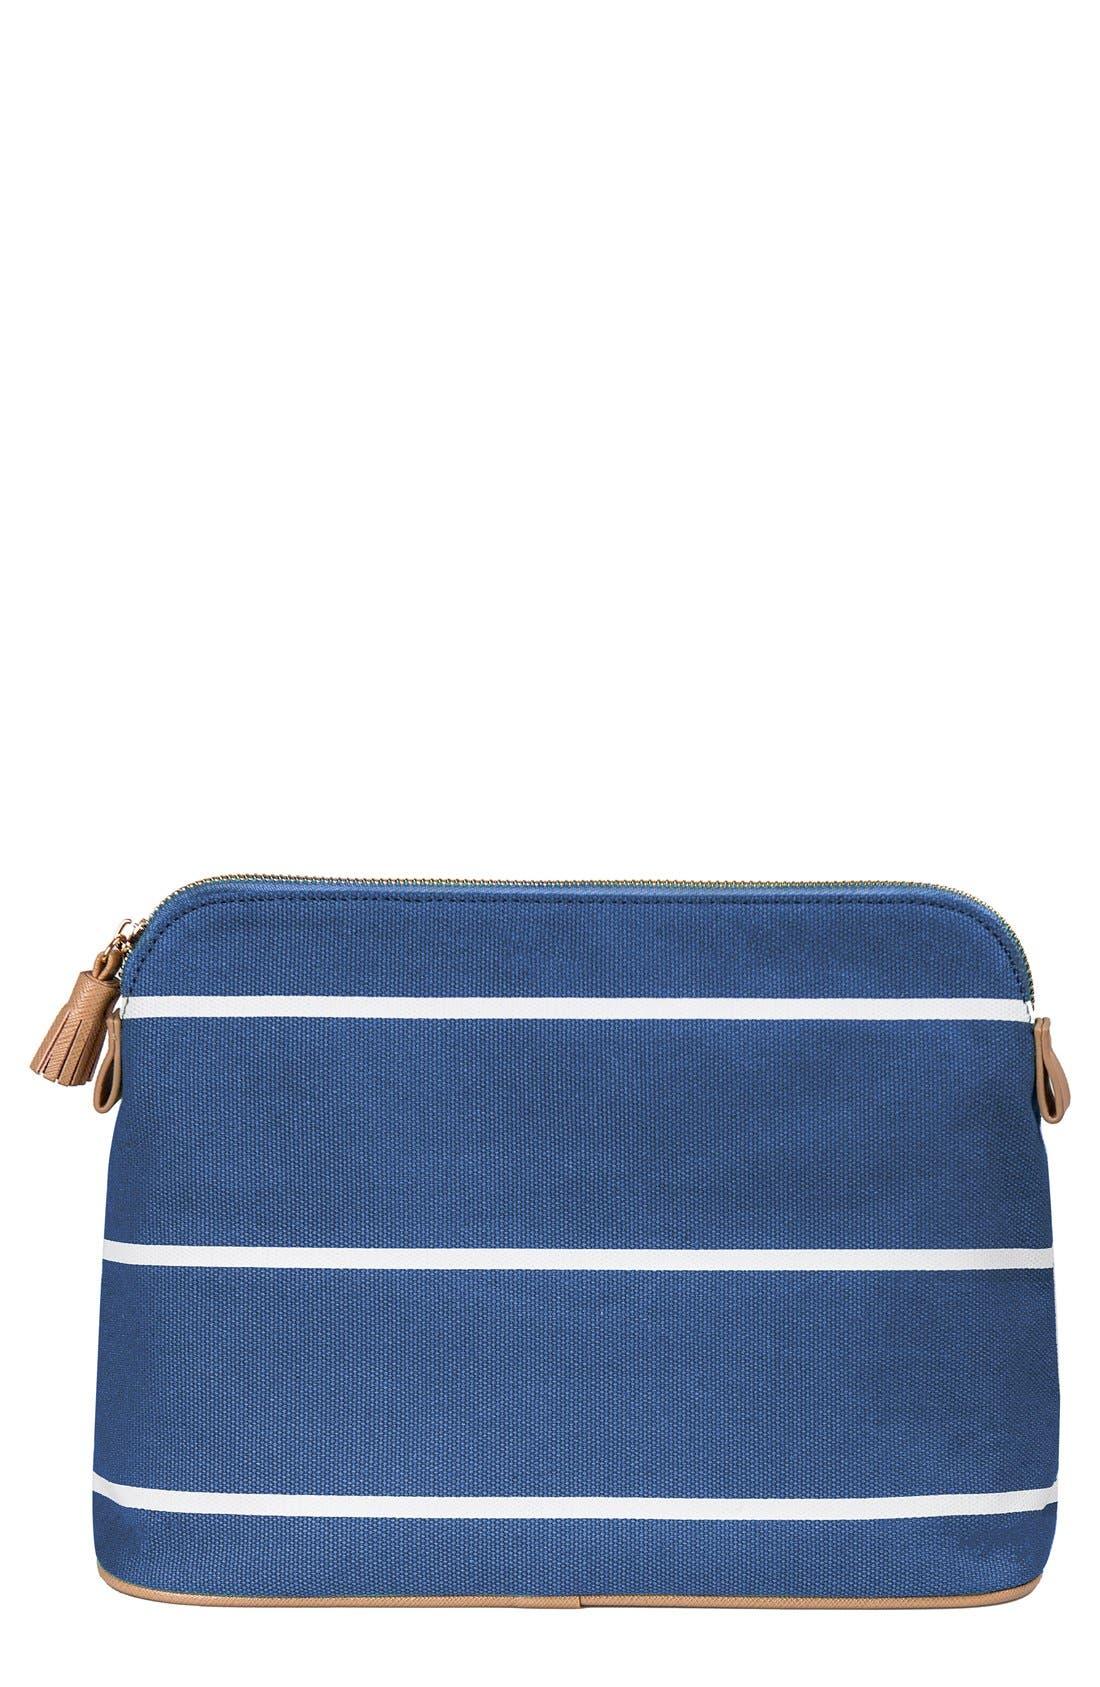 Monogram Cosmetics Bag,                         Main,                         color, BLUE